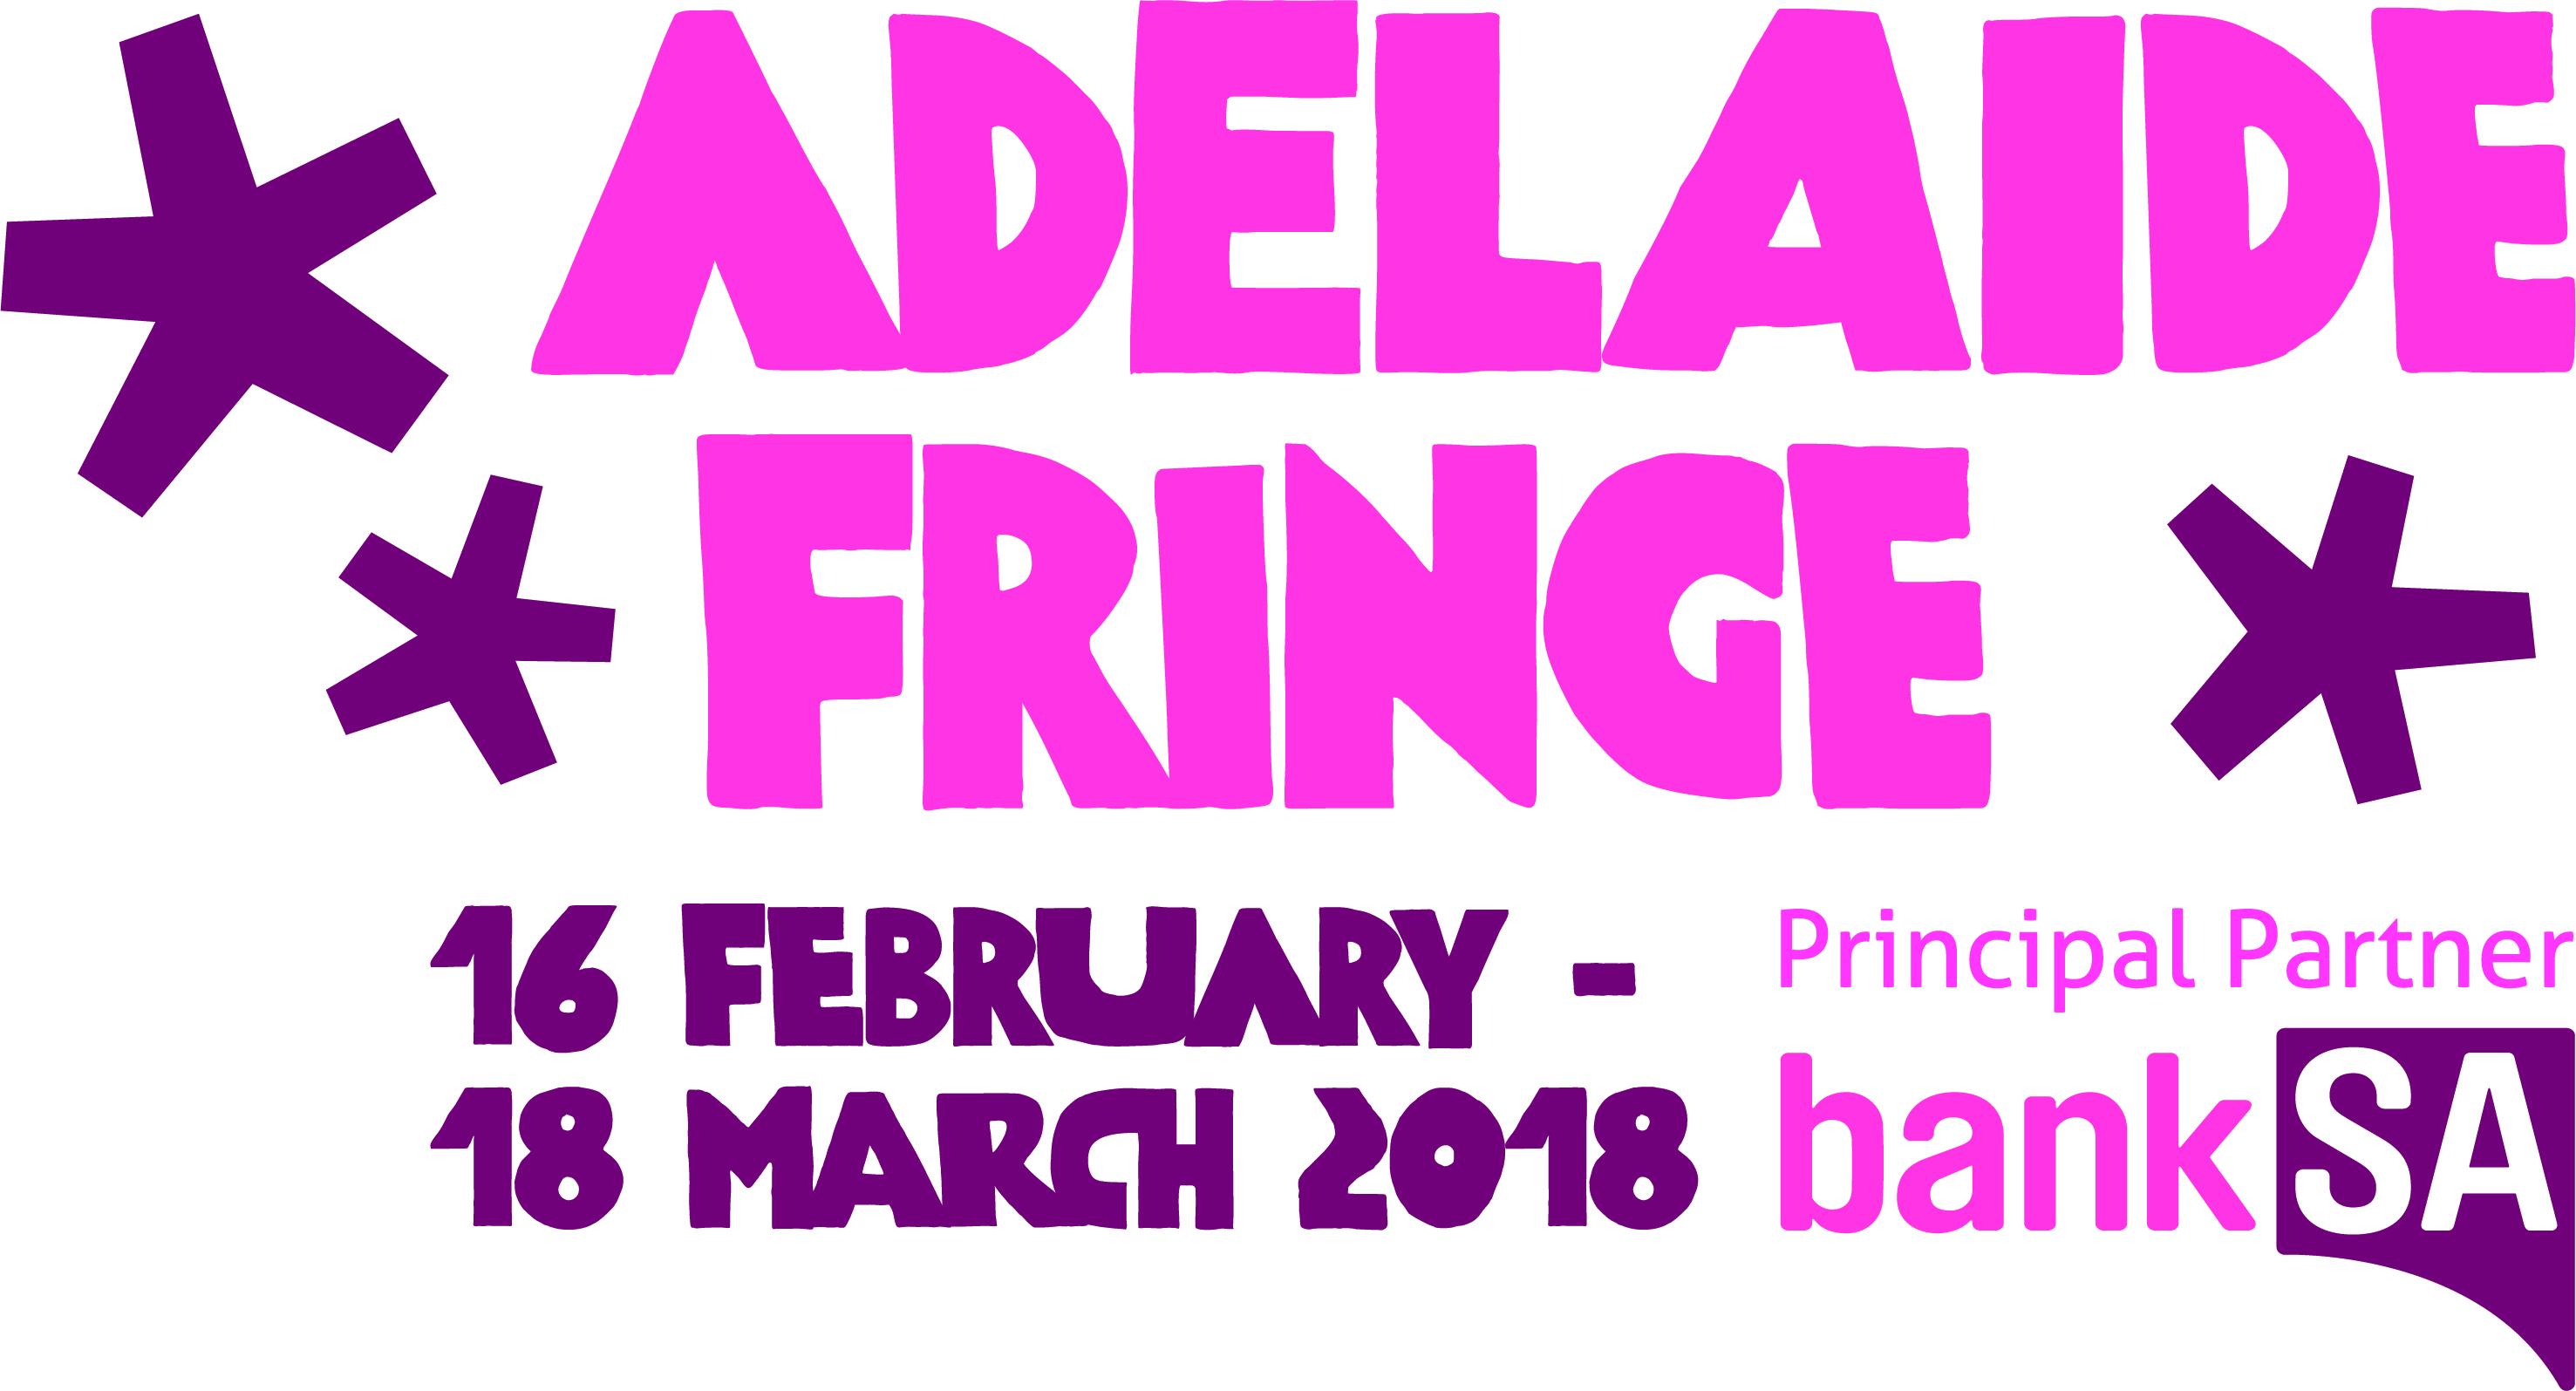 frusic begins as fringe program launches!